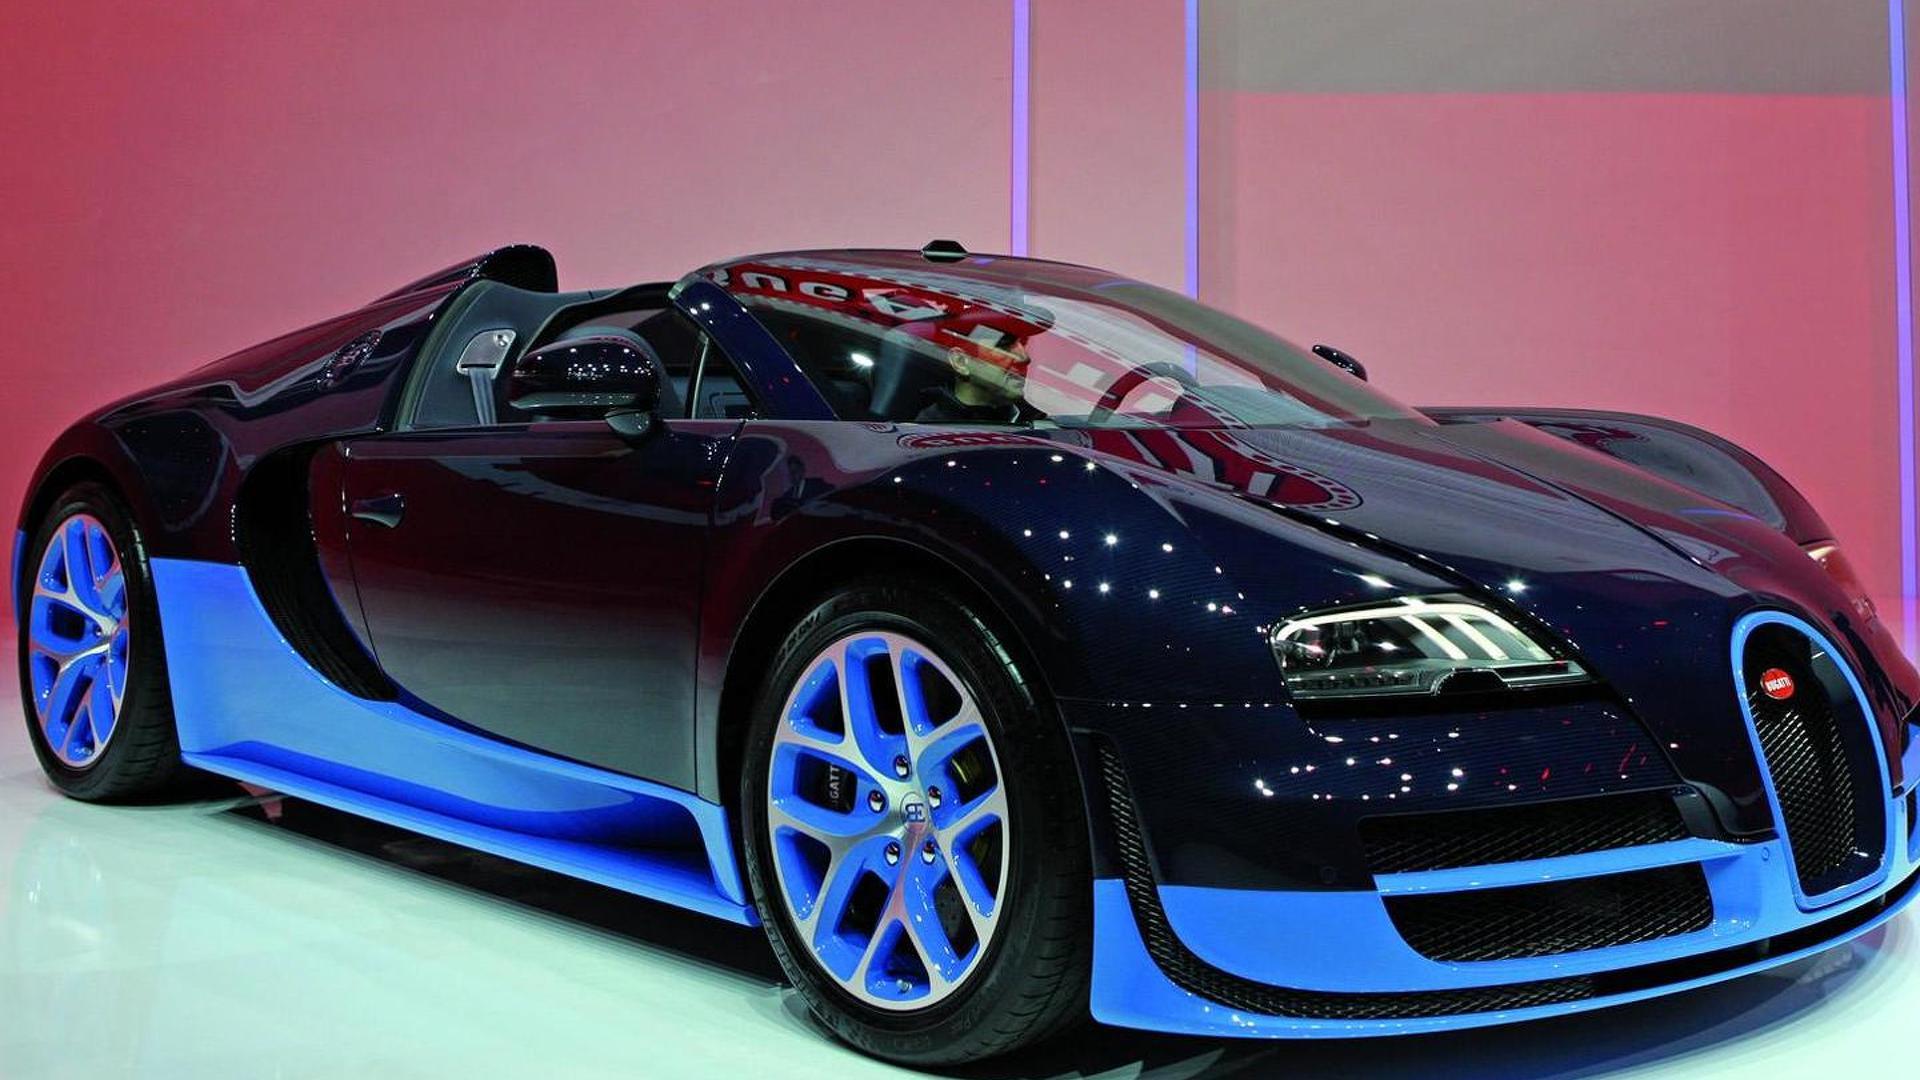 2012-301417-bugatti-veyron-grand-sport-vitesse-presentation-in-geneva1 Fabulous 2012 Bugatti Veyron Grand Sport Vitesse Specs Cars Trend